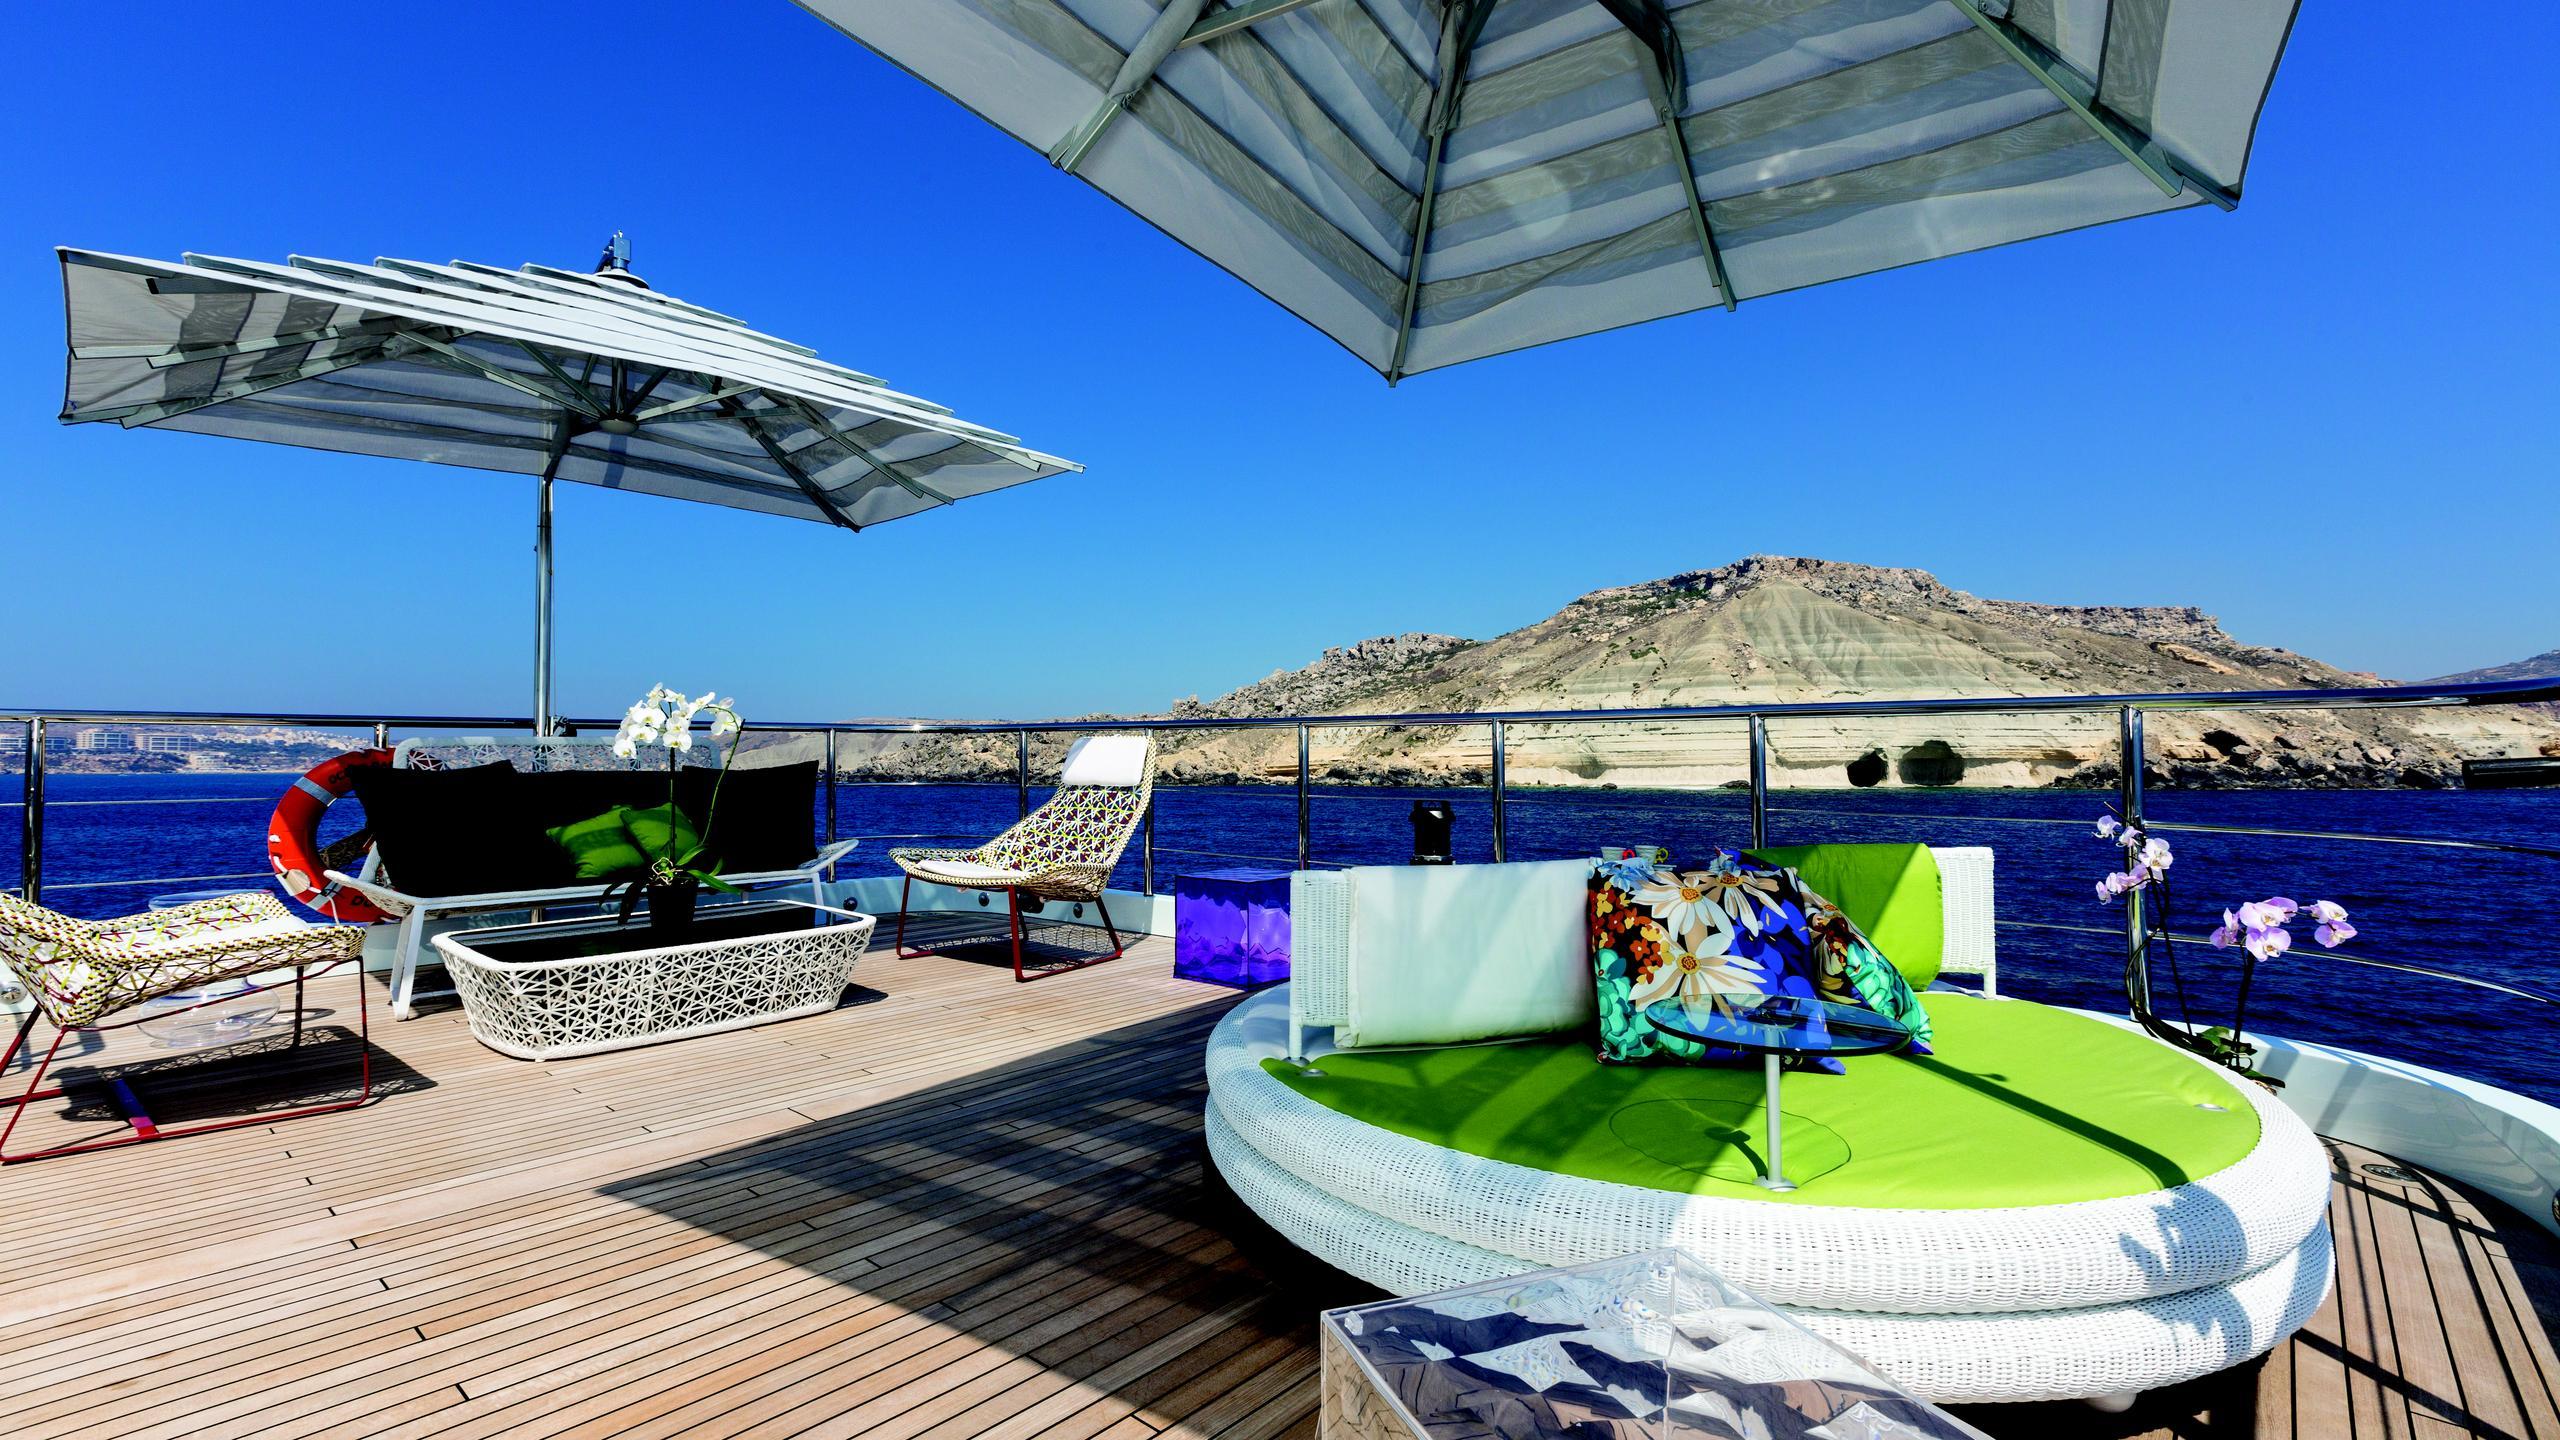 ocean-paradise-yacht-upper-deck